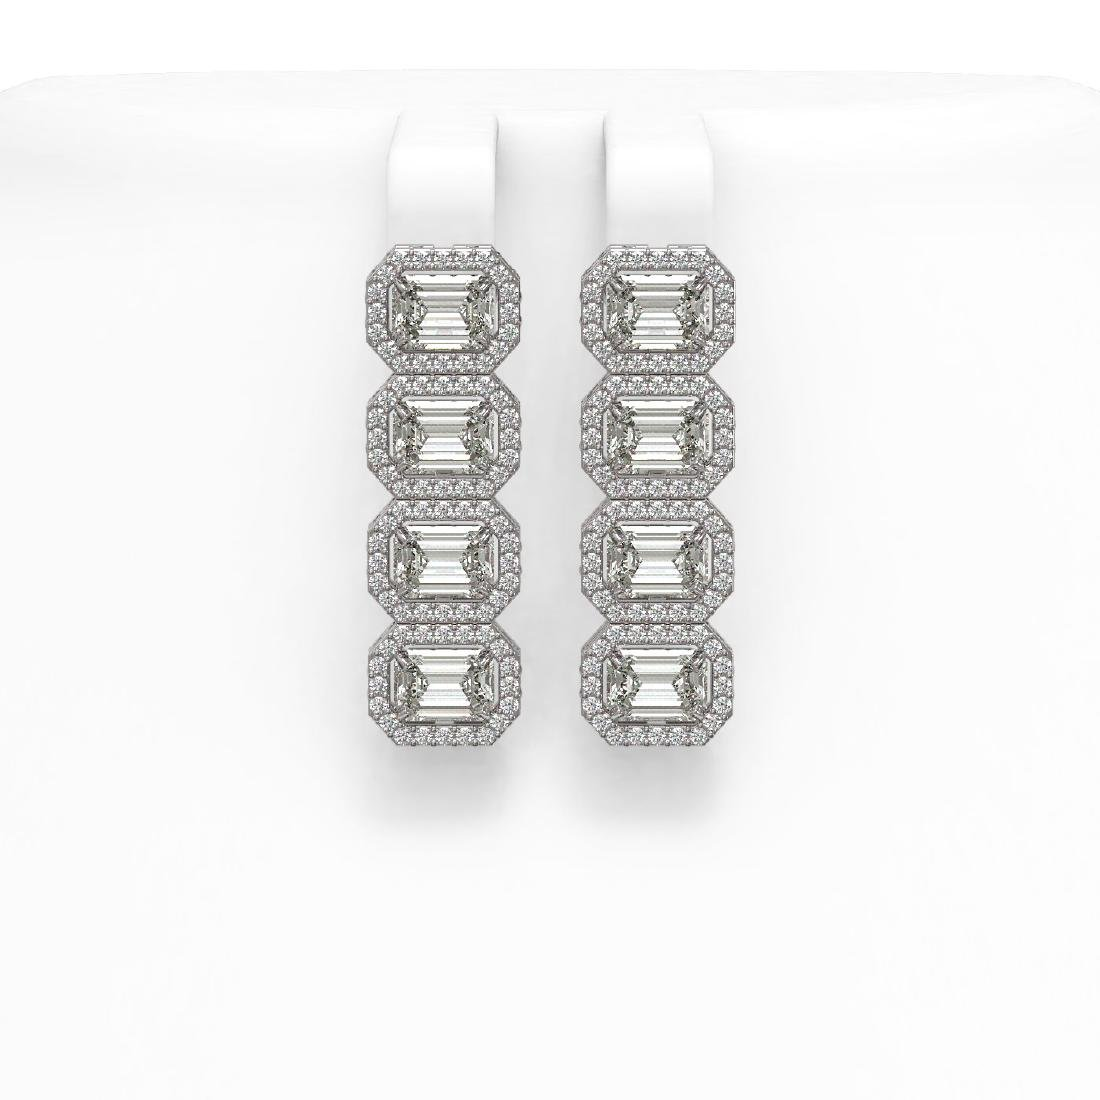 5.92 CTW Emerald Cut Diamond Designer Earrings 18K